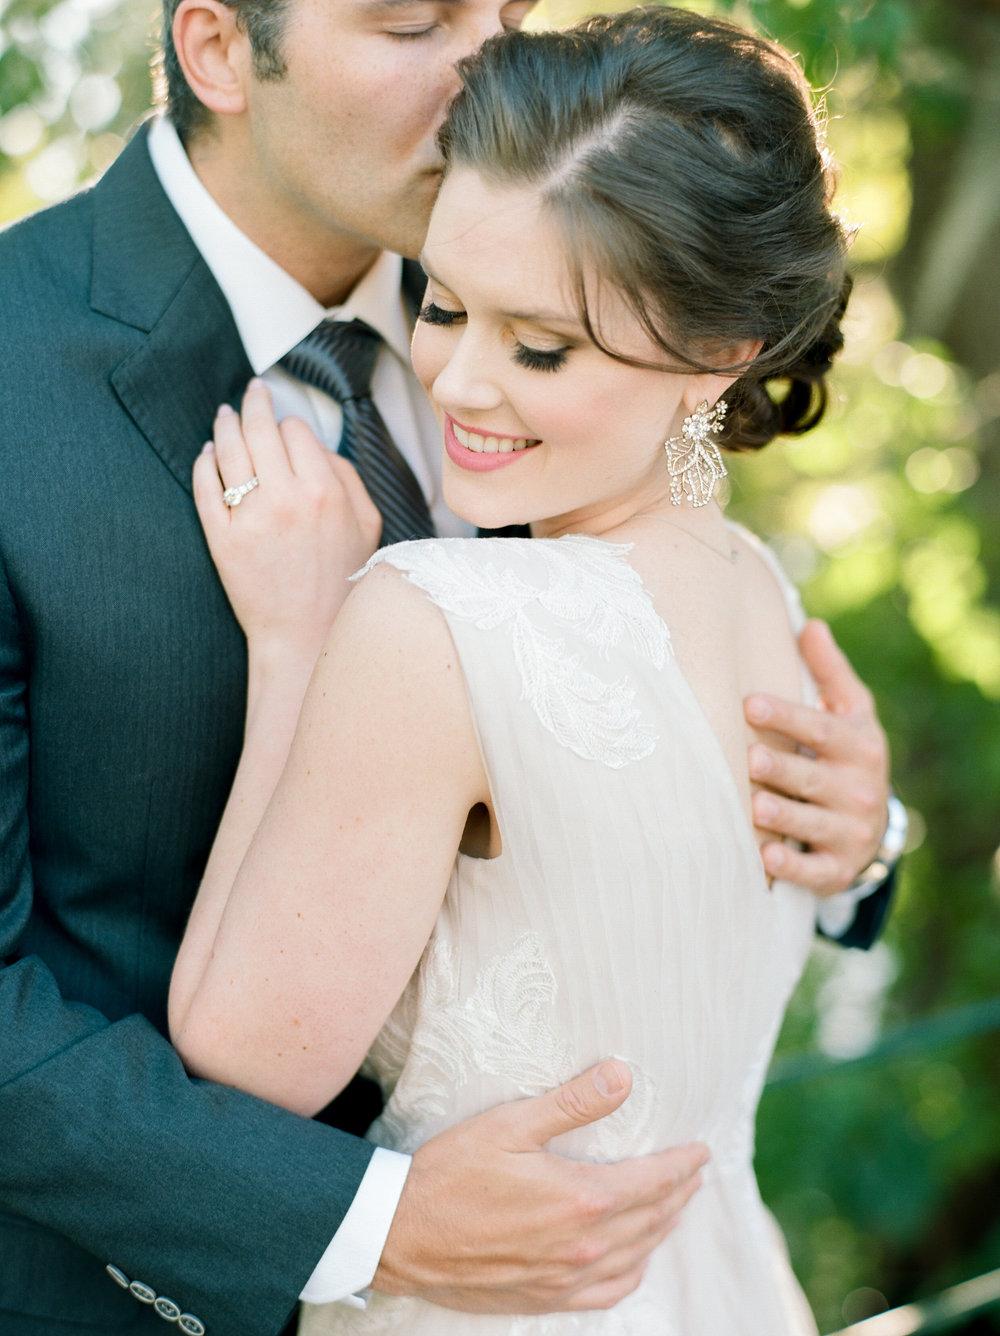 Houston-Wedding-Photographer-Lakeside-Country-Club-First-Look-Bride-Groom-Formals-Film-Fine-Art-Photography-25.jpg